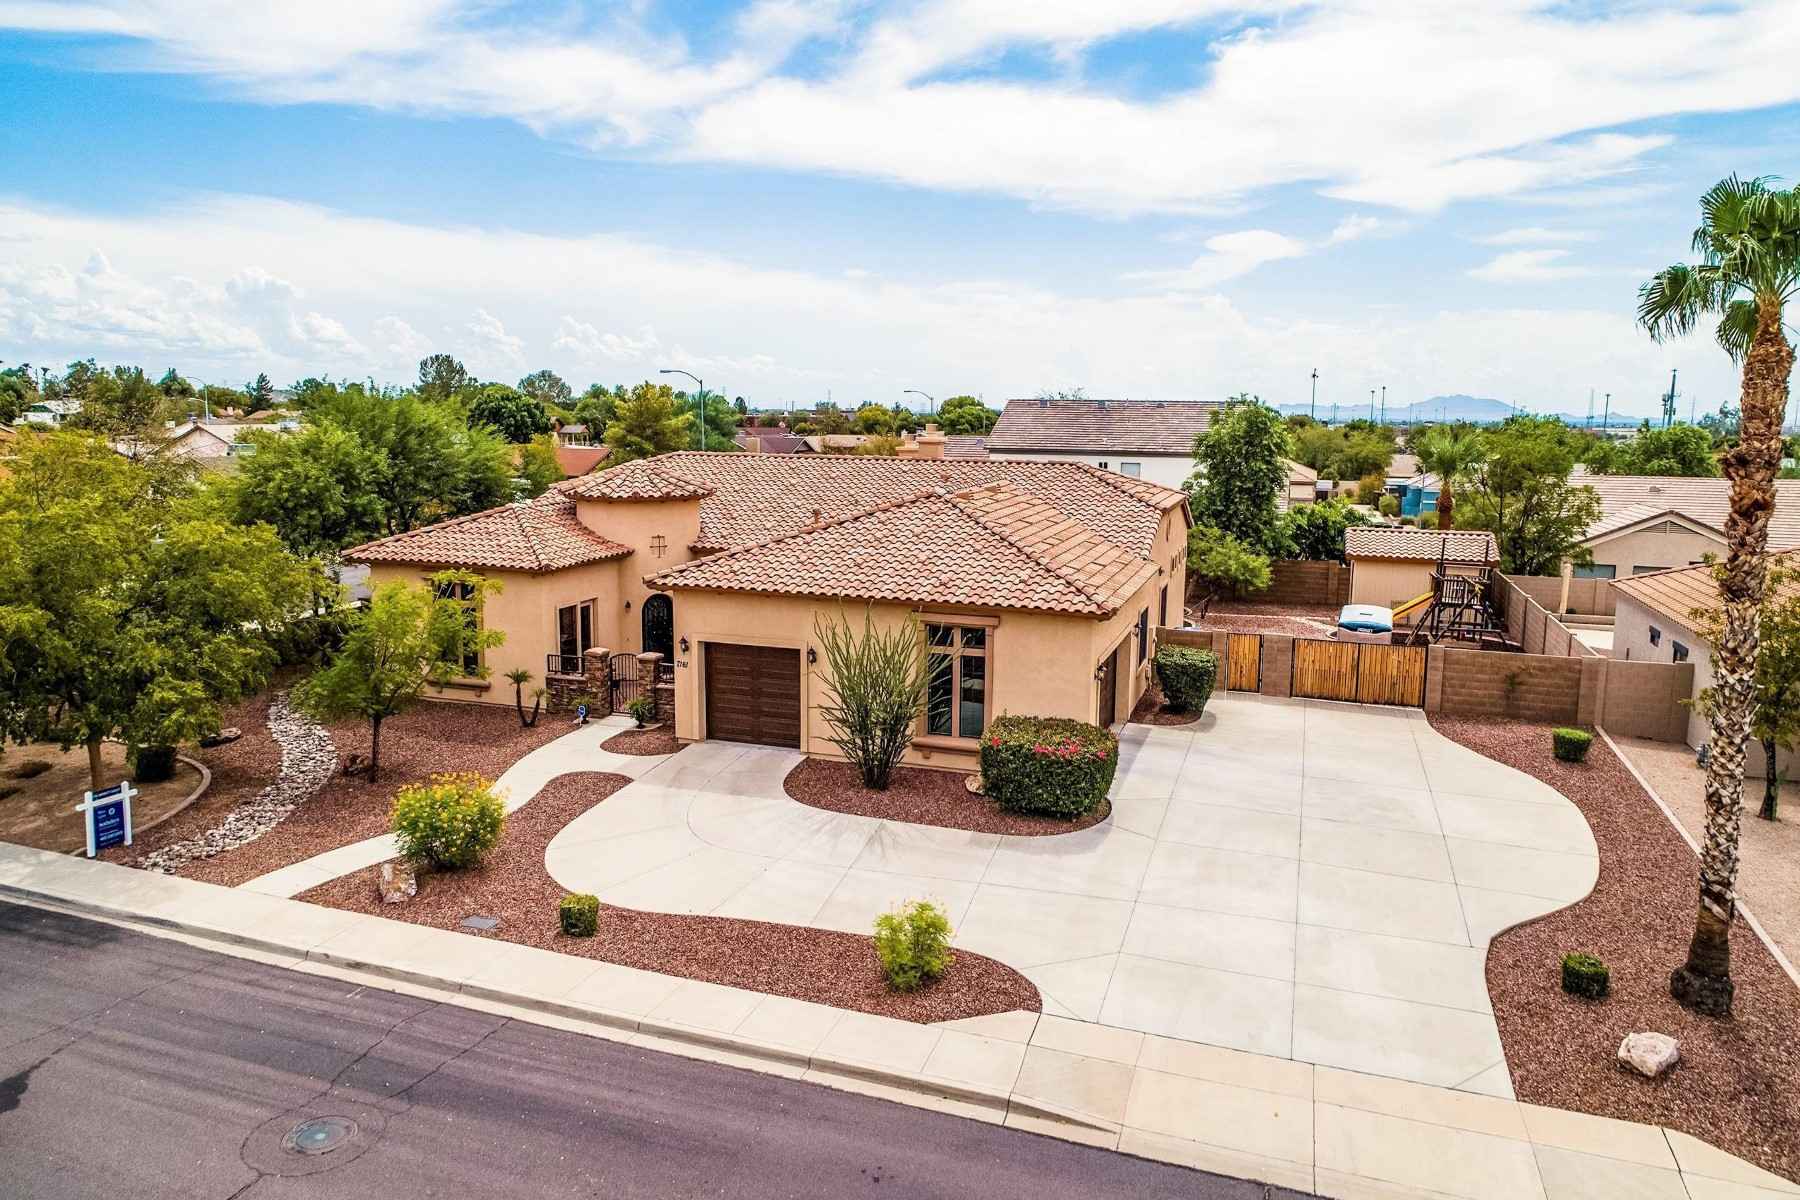 Single Family Homes για την Πώληση στο Alta Mira Estates 7161 E GRANADA ST, Mesa, Αριζονα 85207 Ηνωμένες Πολιτείες